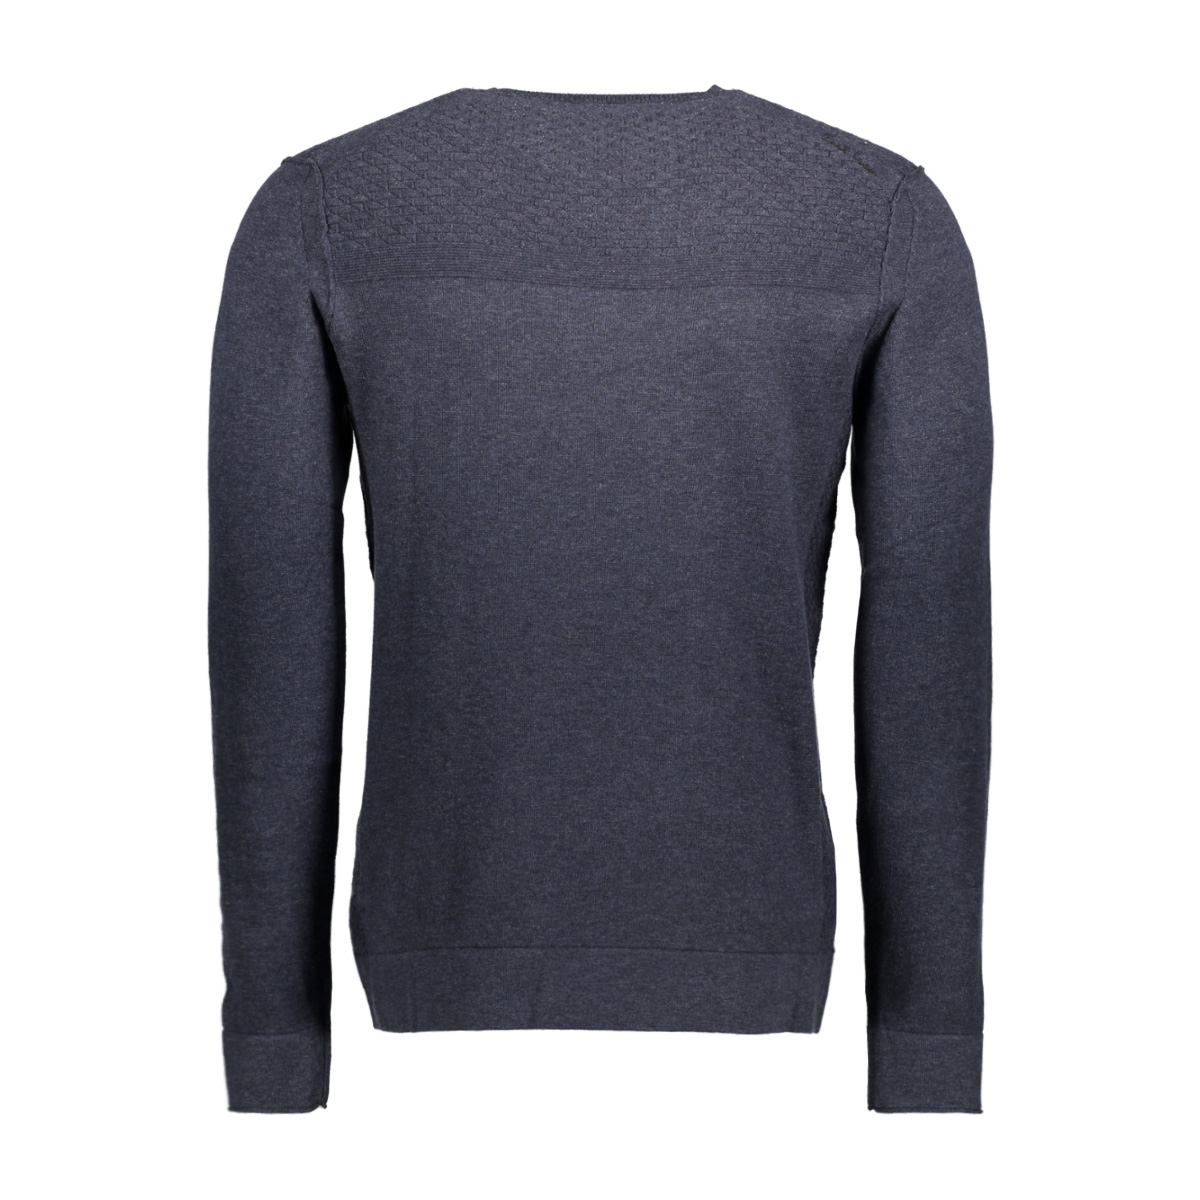 ckw175400 cast iron sweater 5350